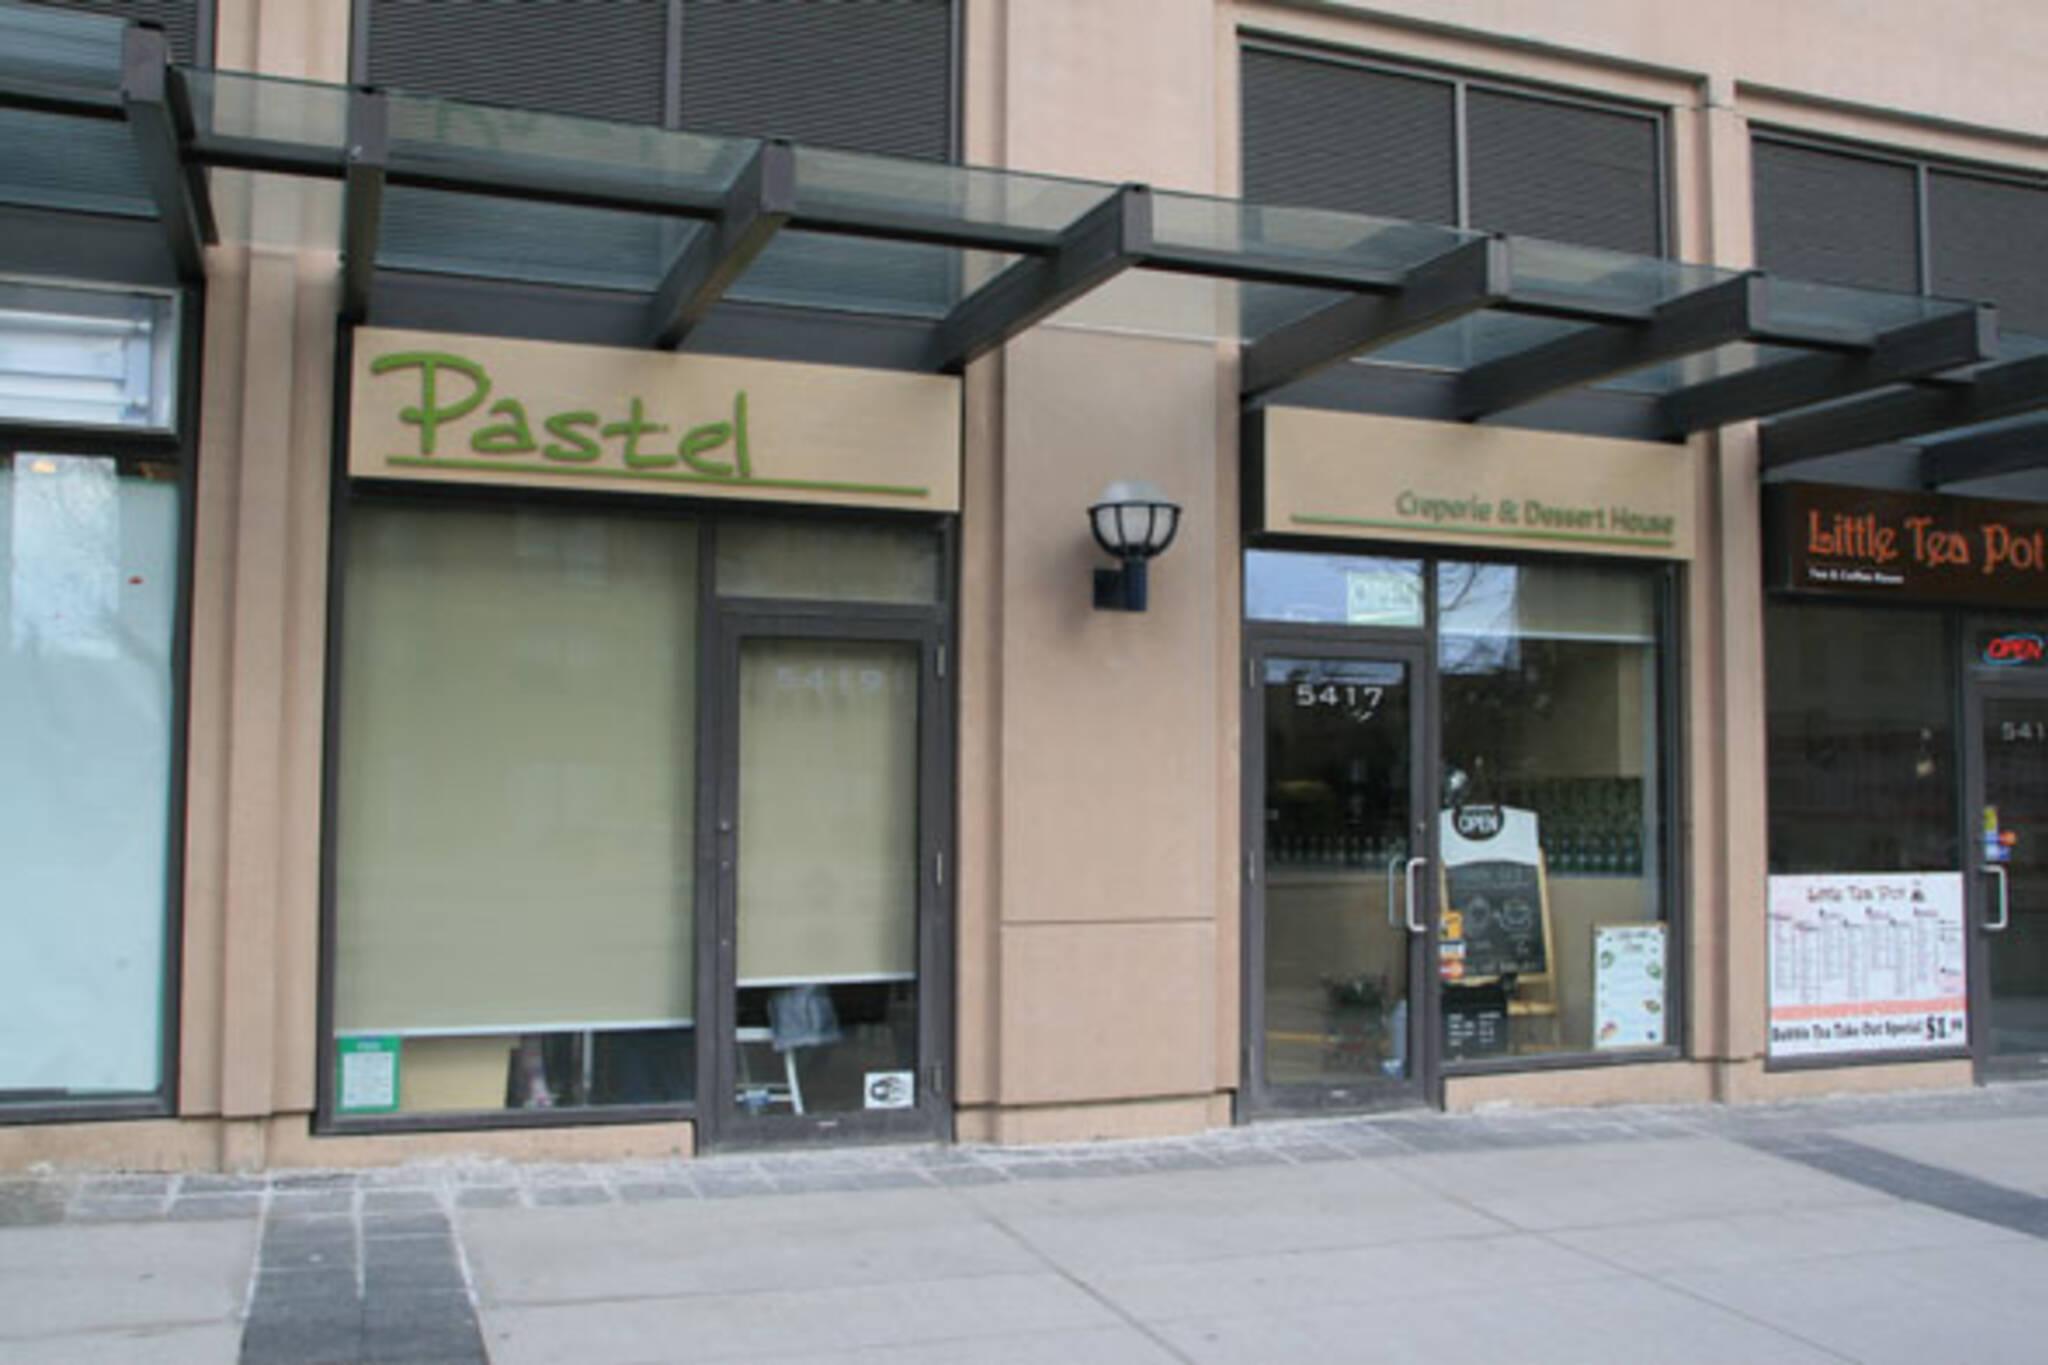 Pastel Toronto